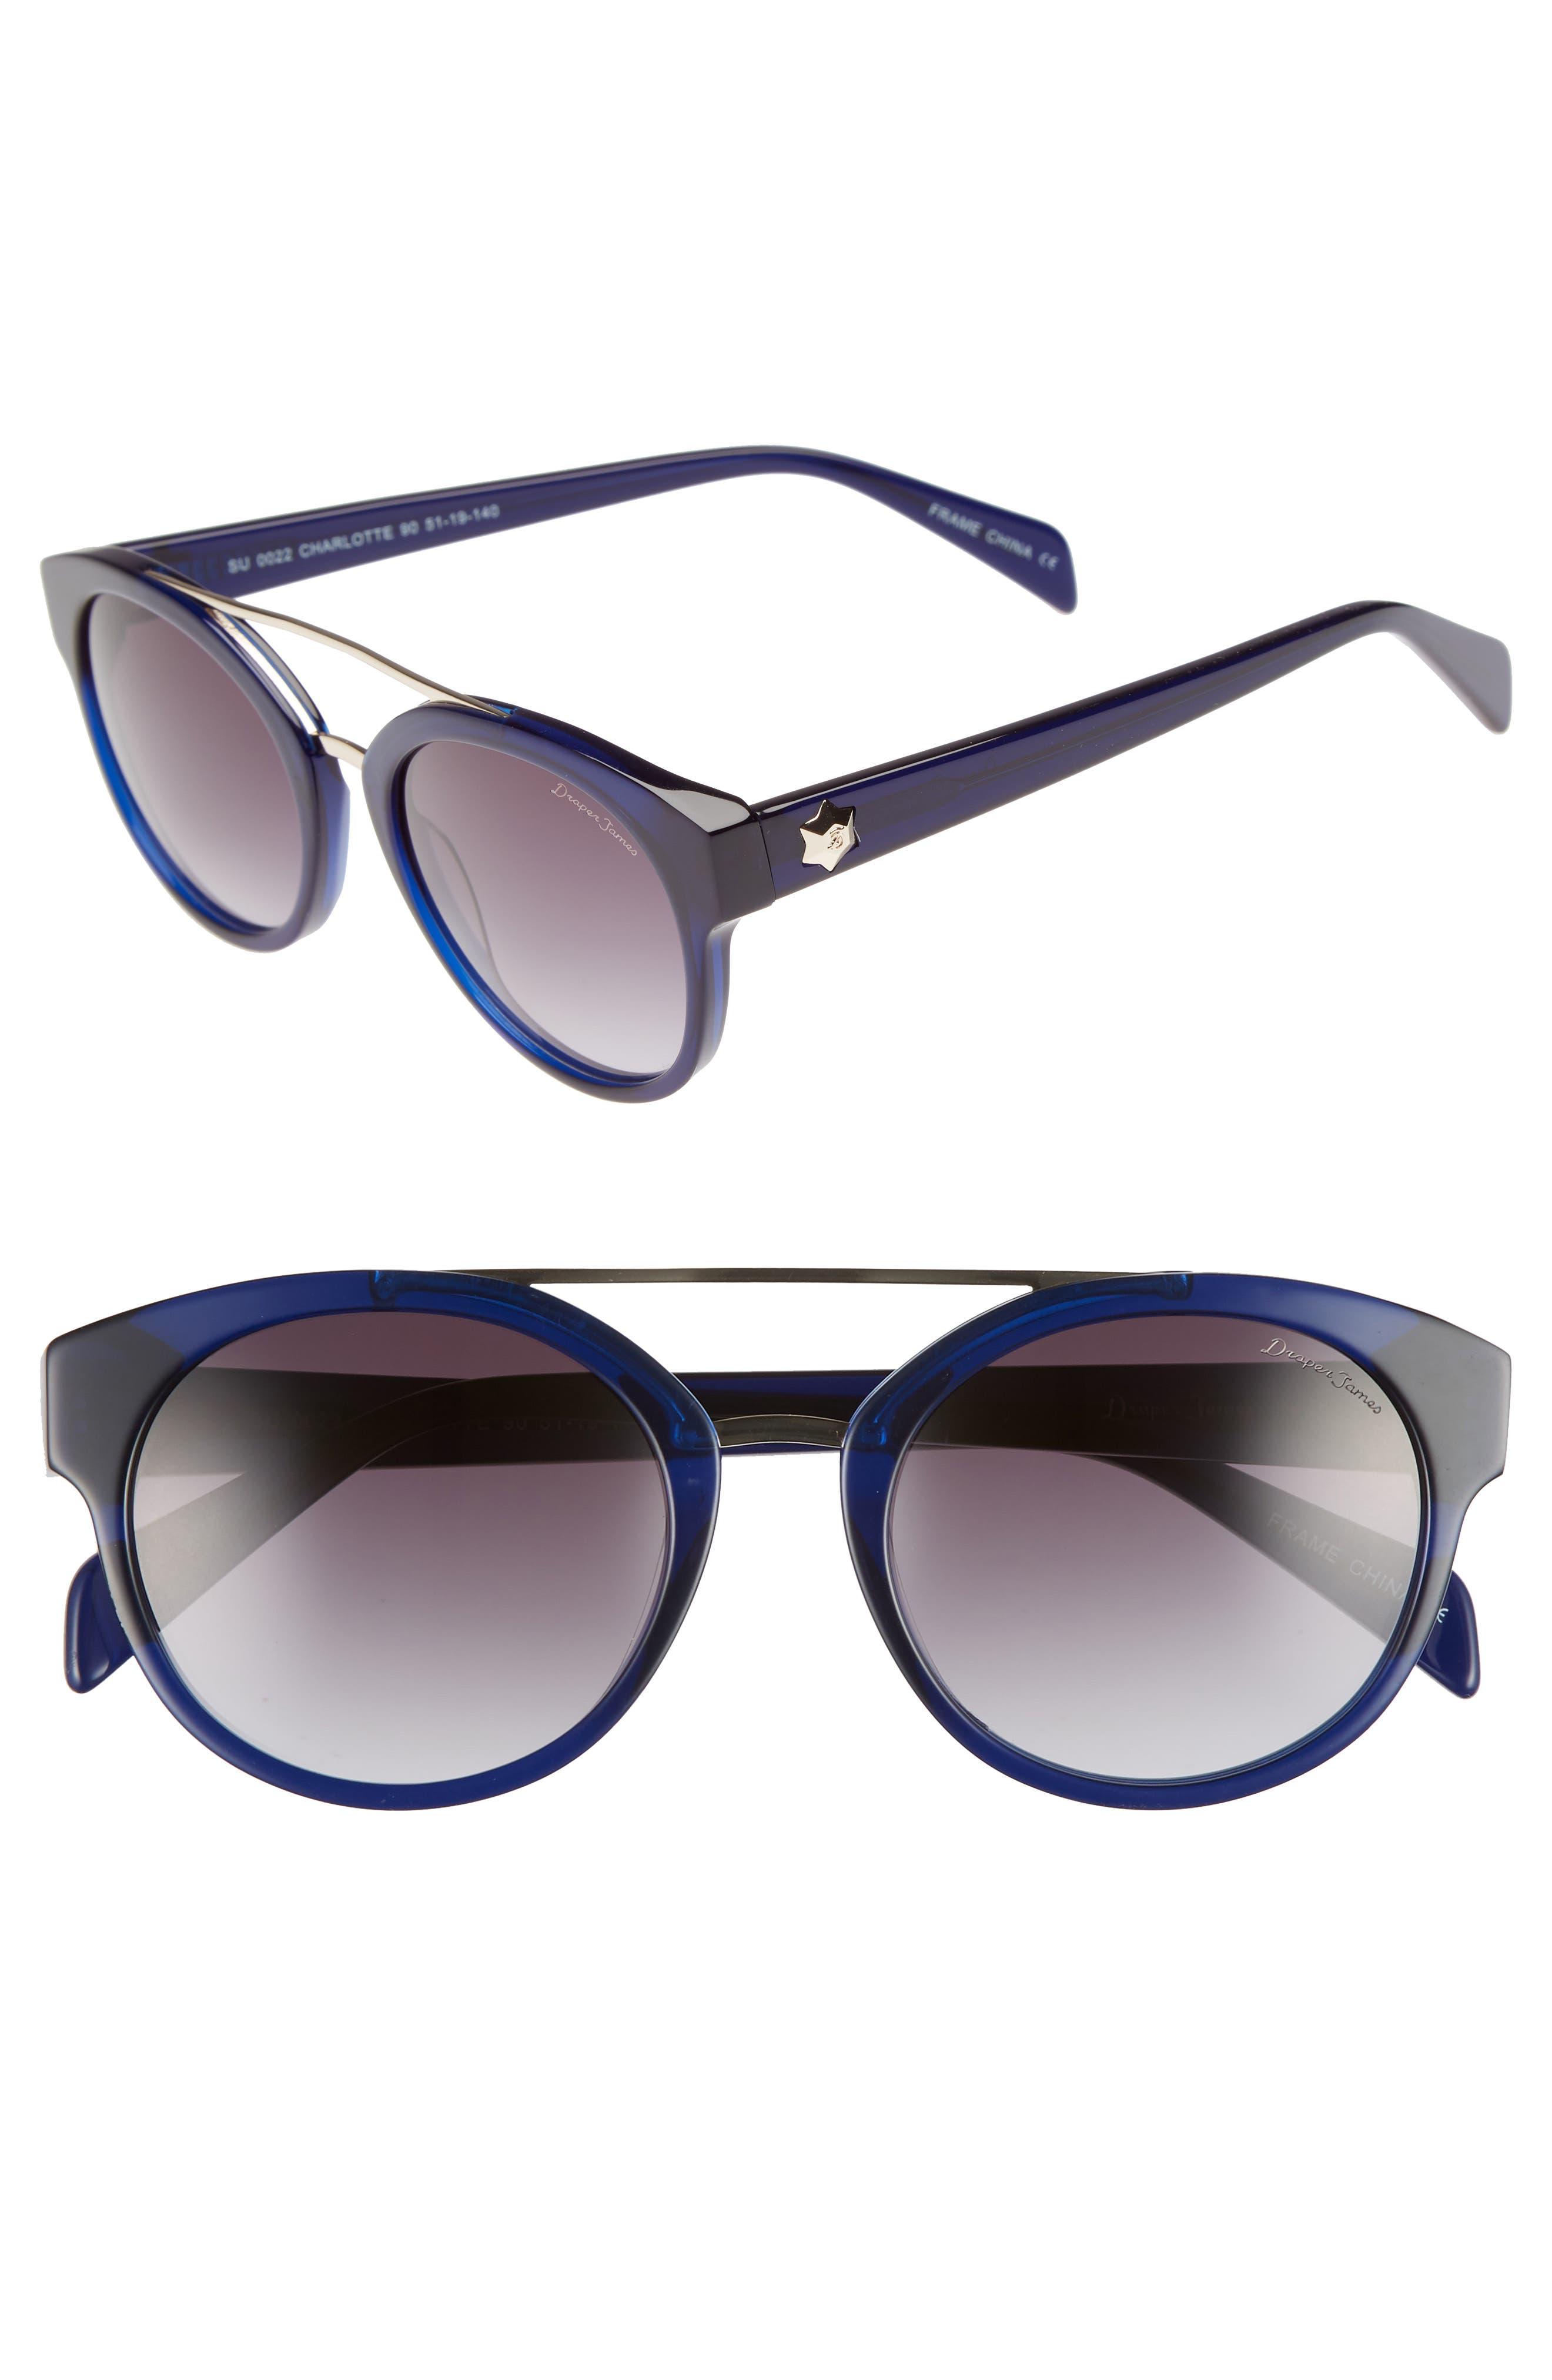 DRAPER JAMES 51Mm Round Sunglasses - Blue